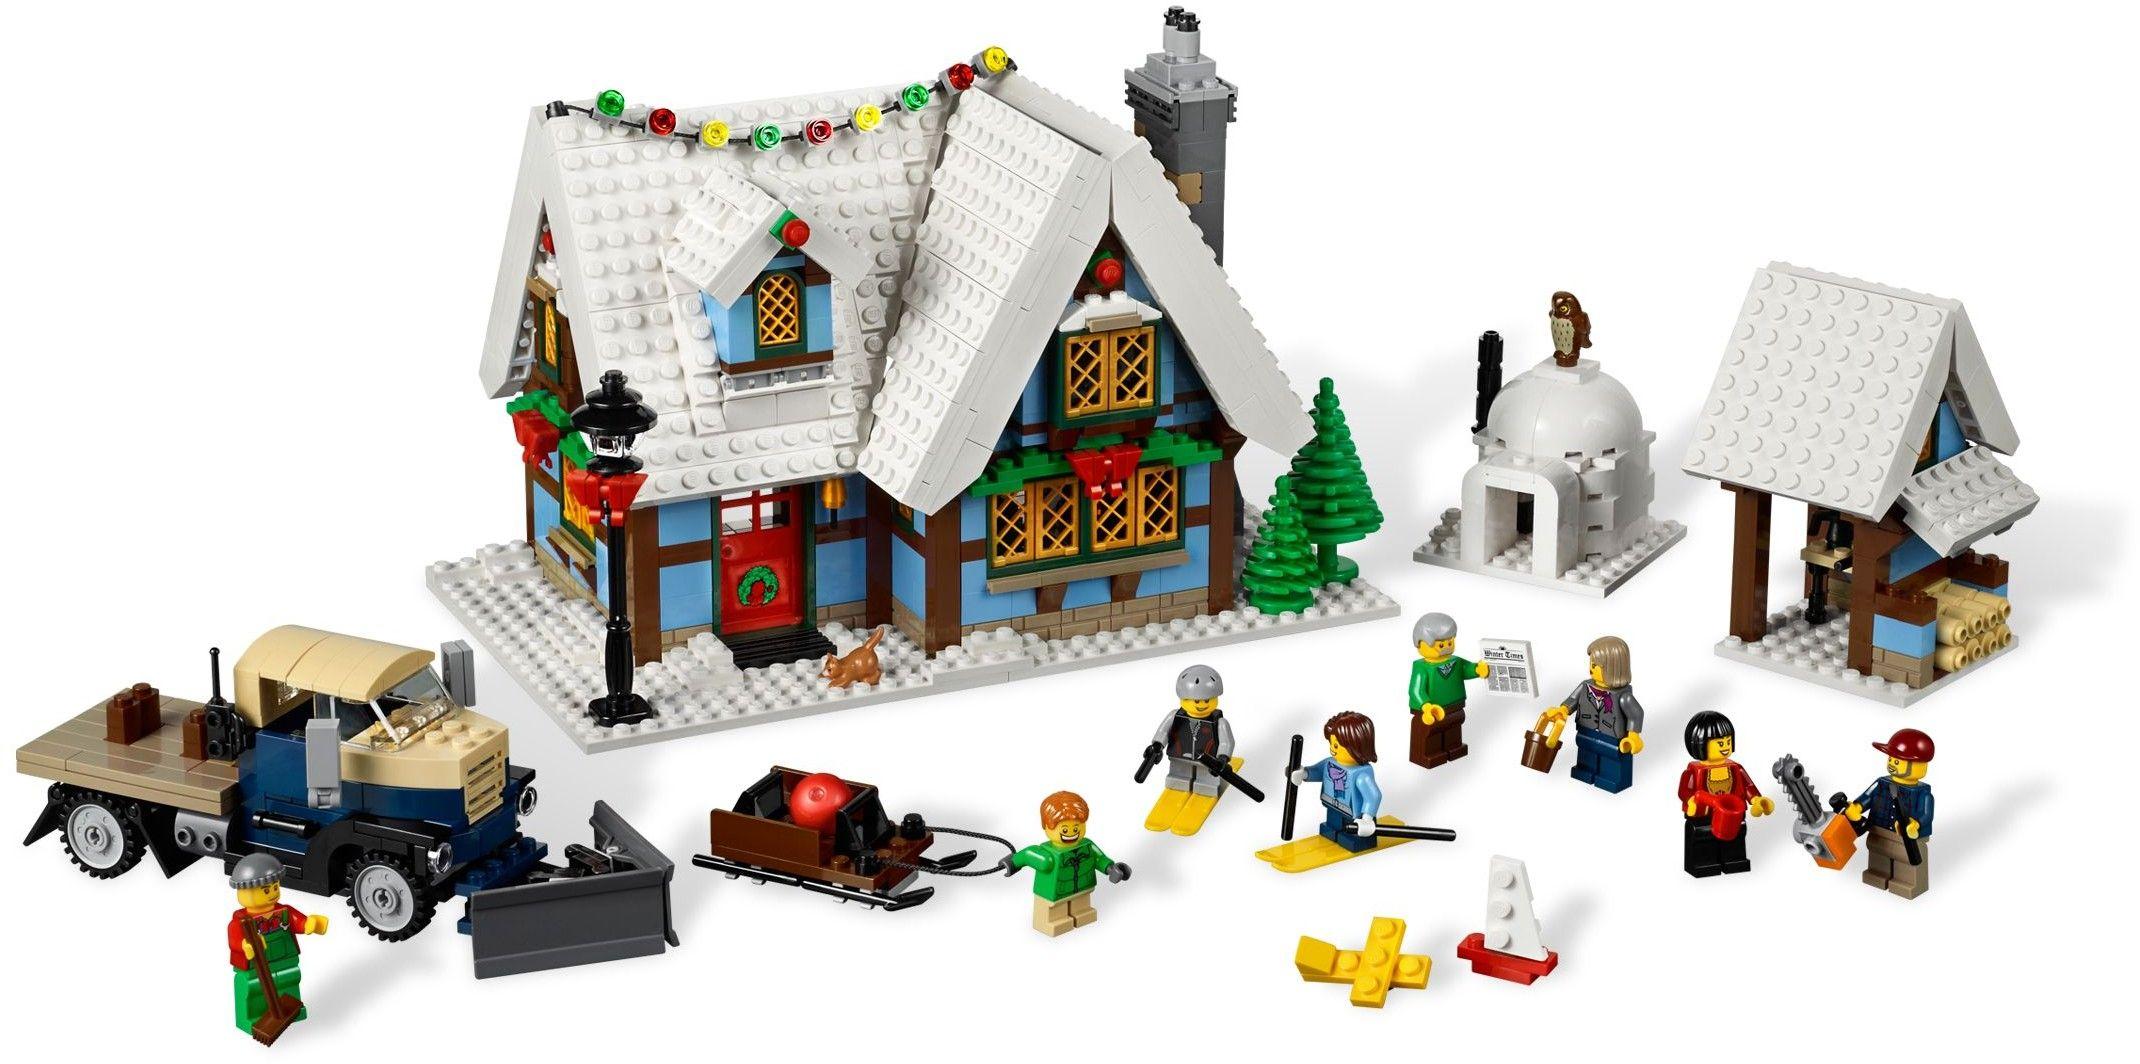 10229 1 Winter Village Cottage Lego Christmas Village Lego Winter Lego Christmas